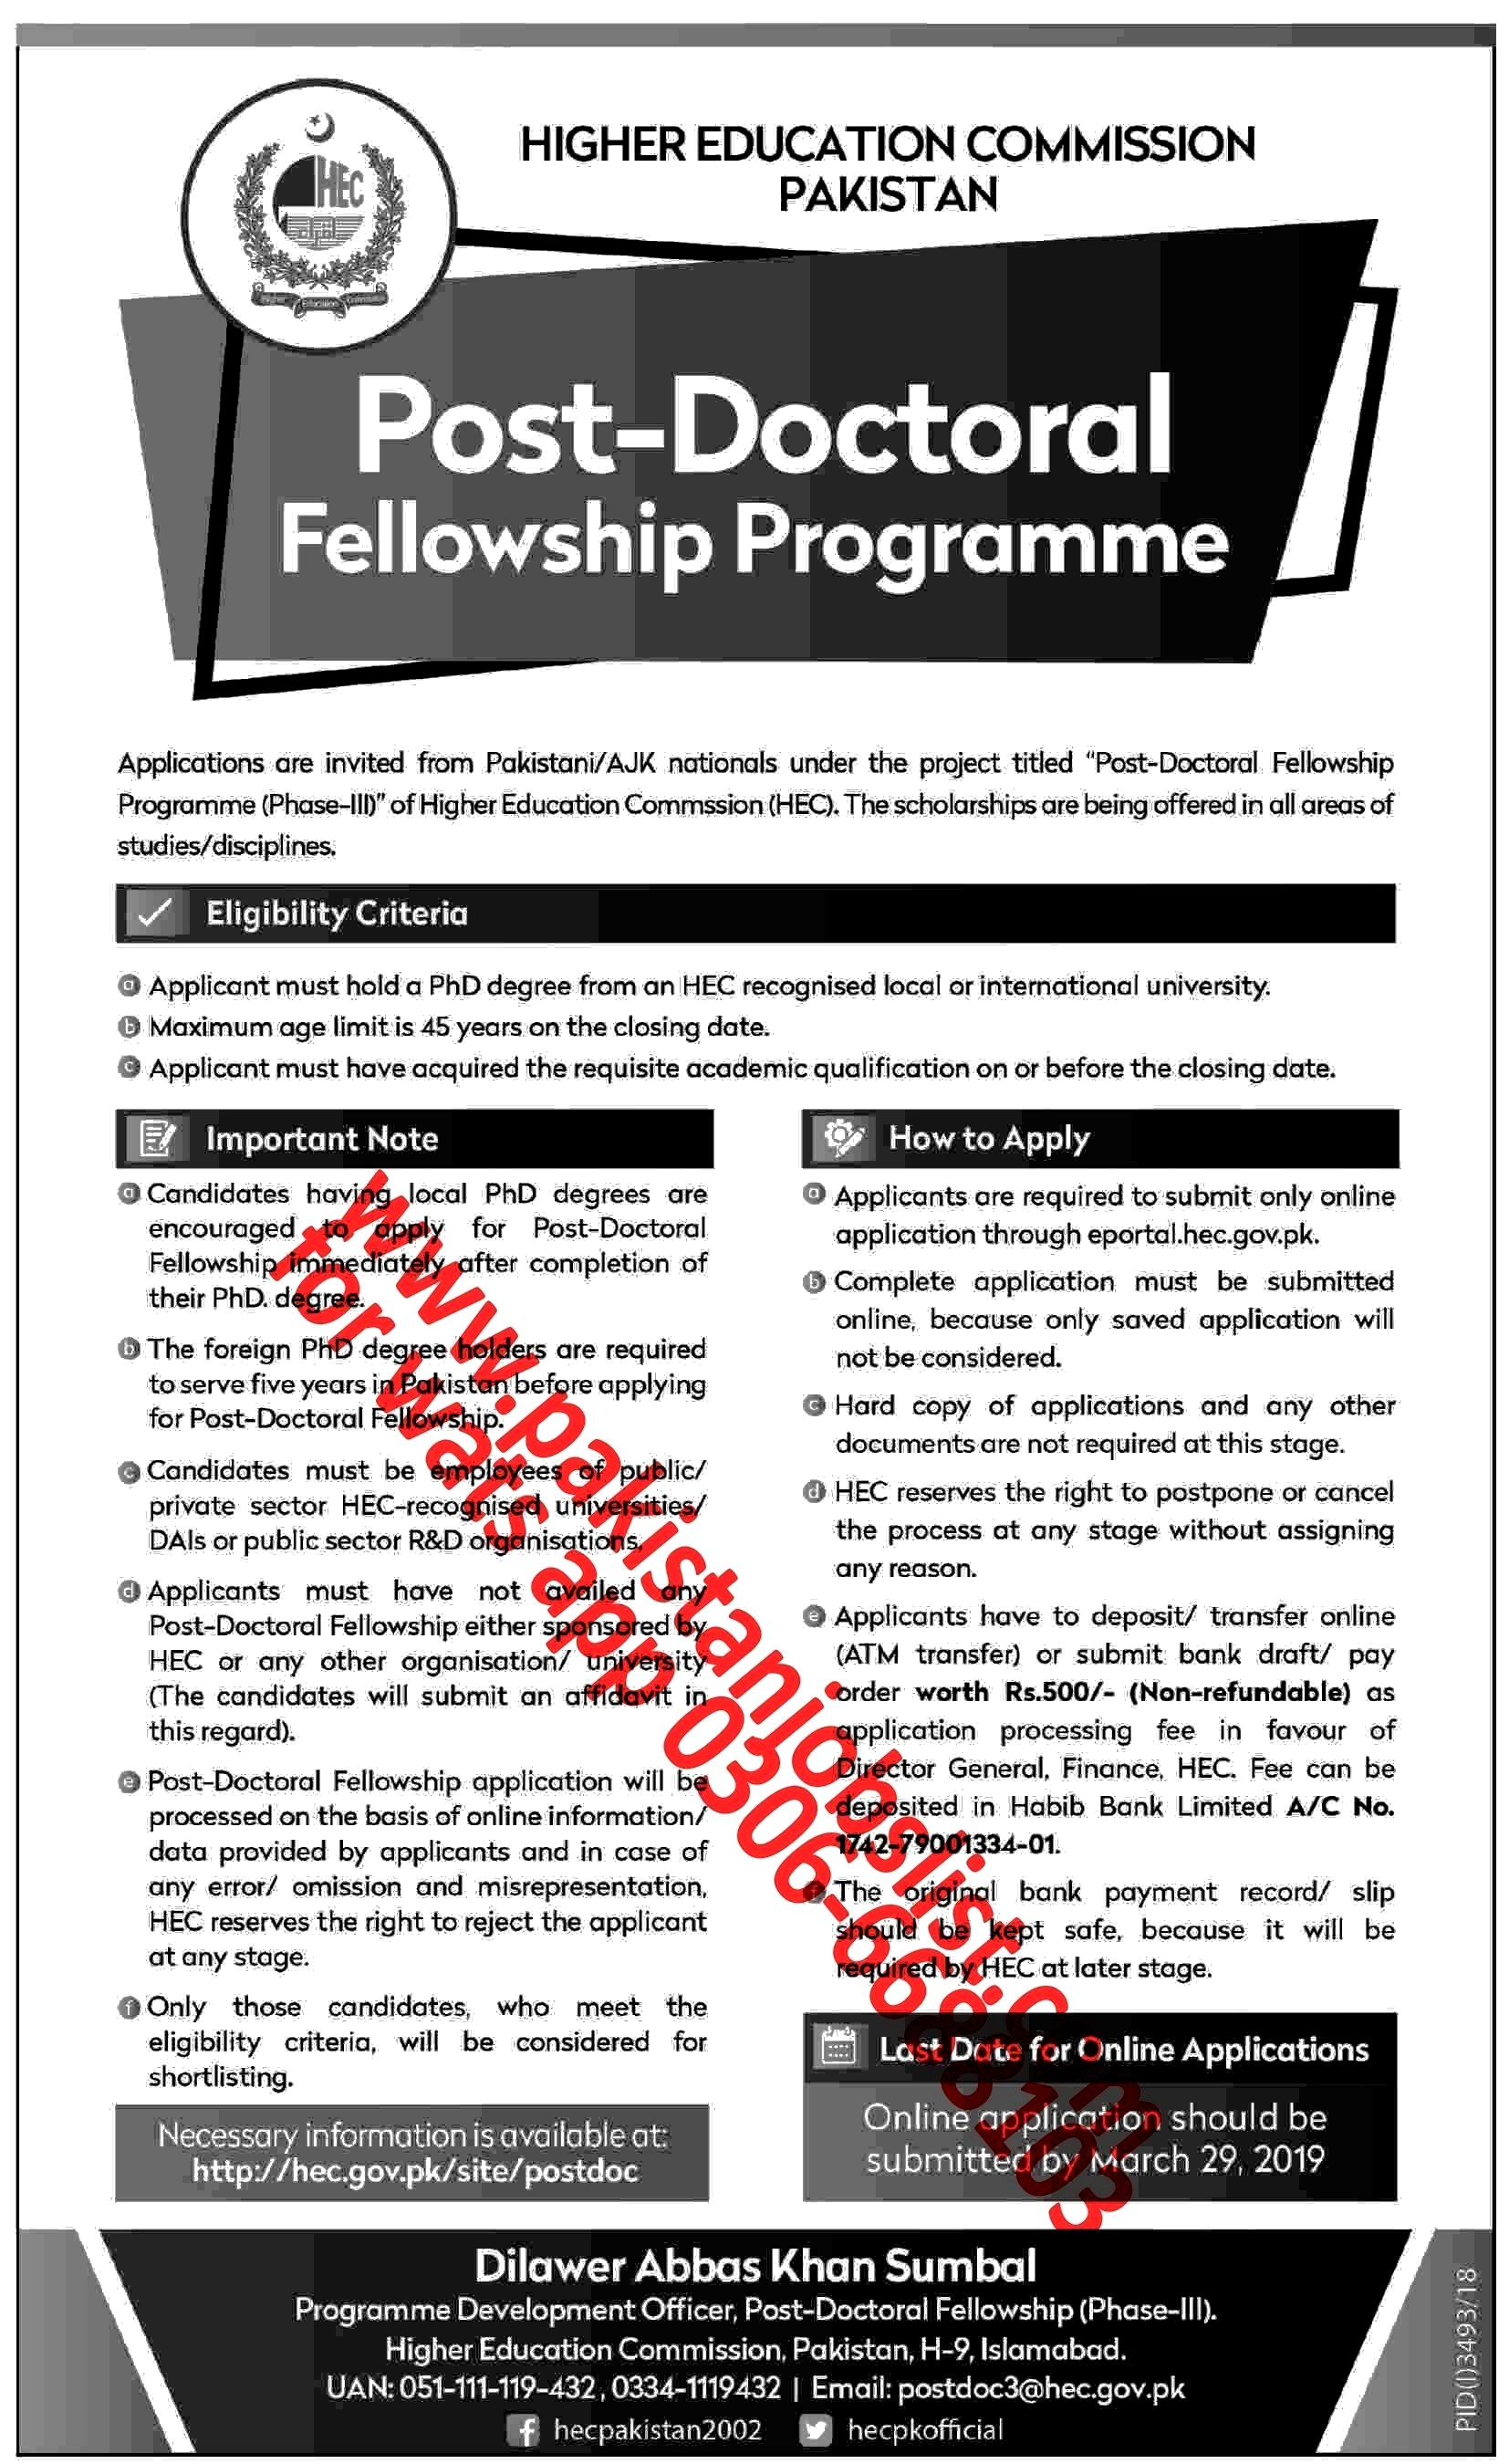 Post-Doctoral Fellowship Programme (Phase-III)